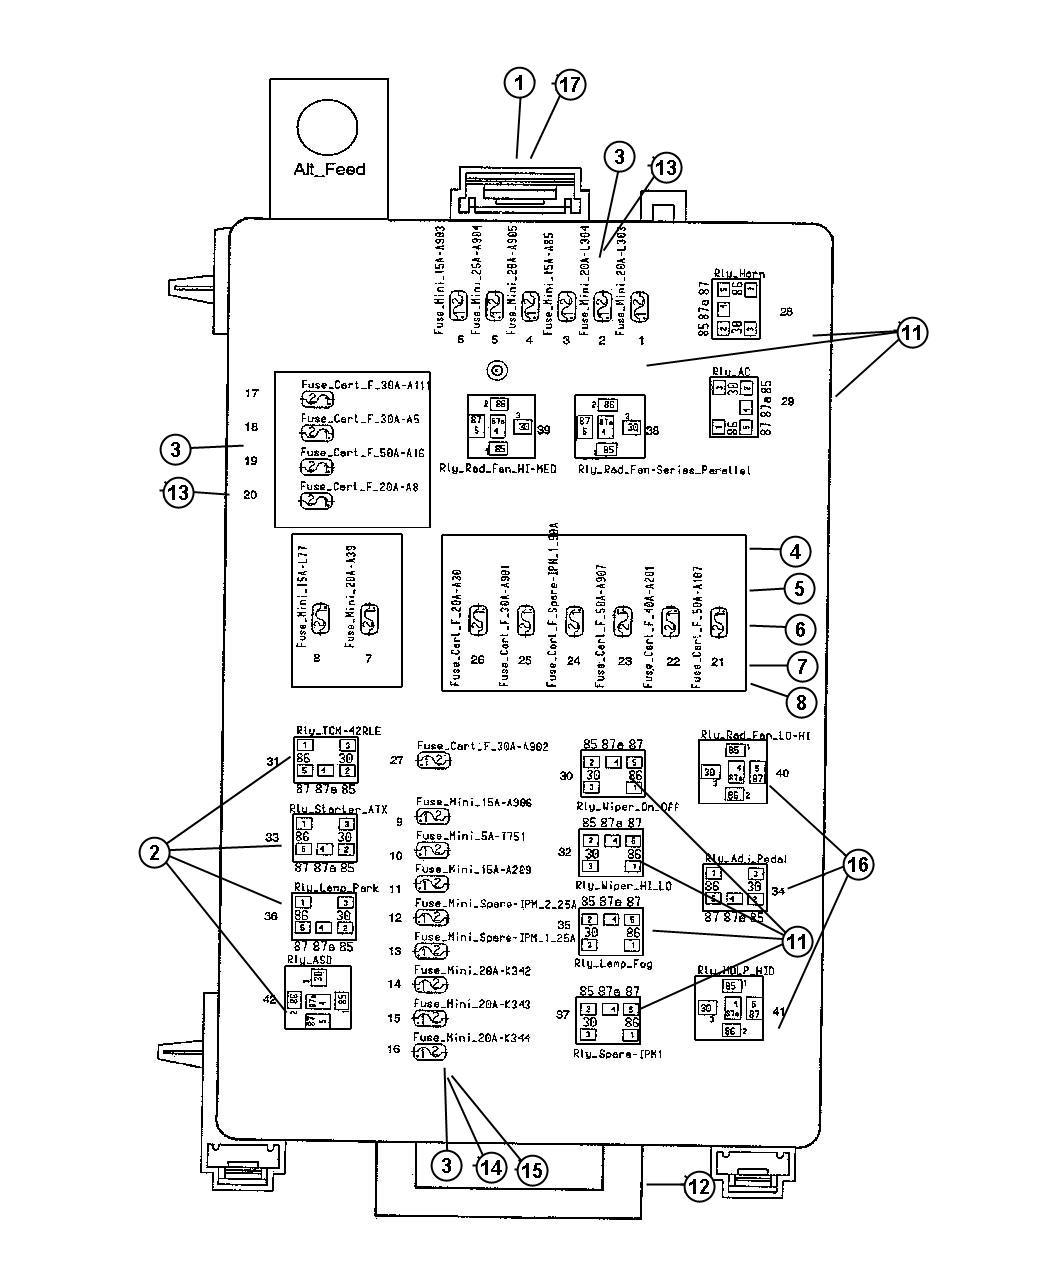 Chrysler 300 Fuse Diagram